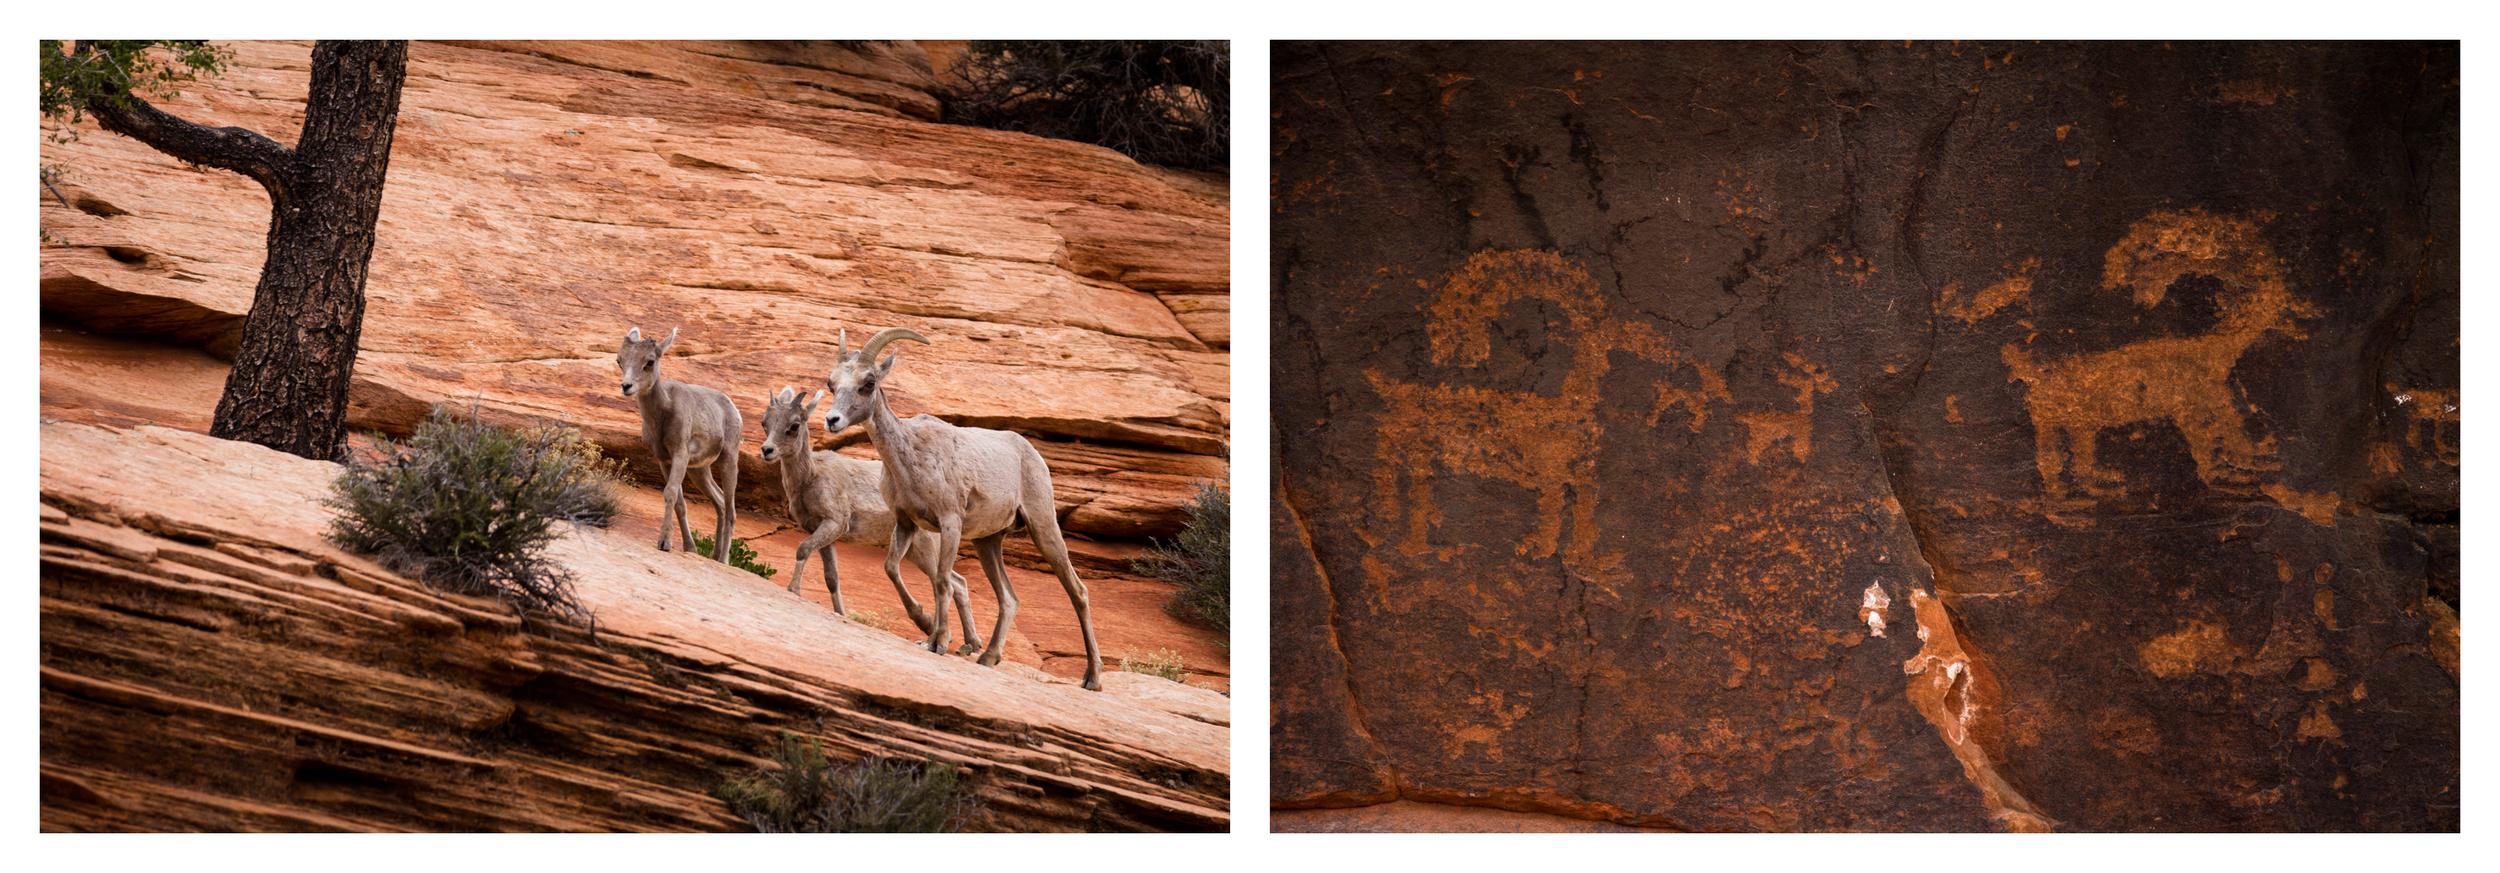 Desert Bighorn Sheep  ( Ovis canadensis nelsoni )  Utah